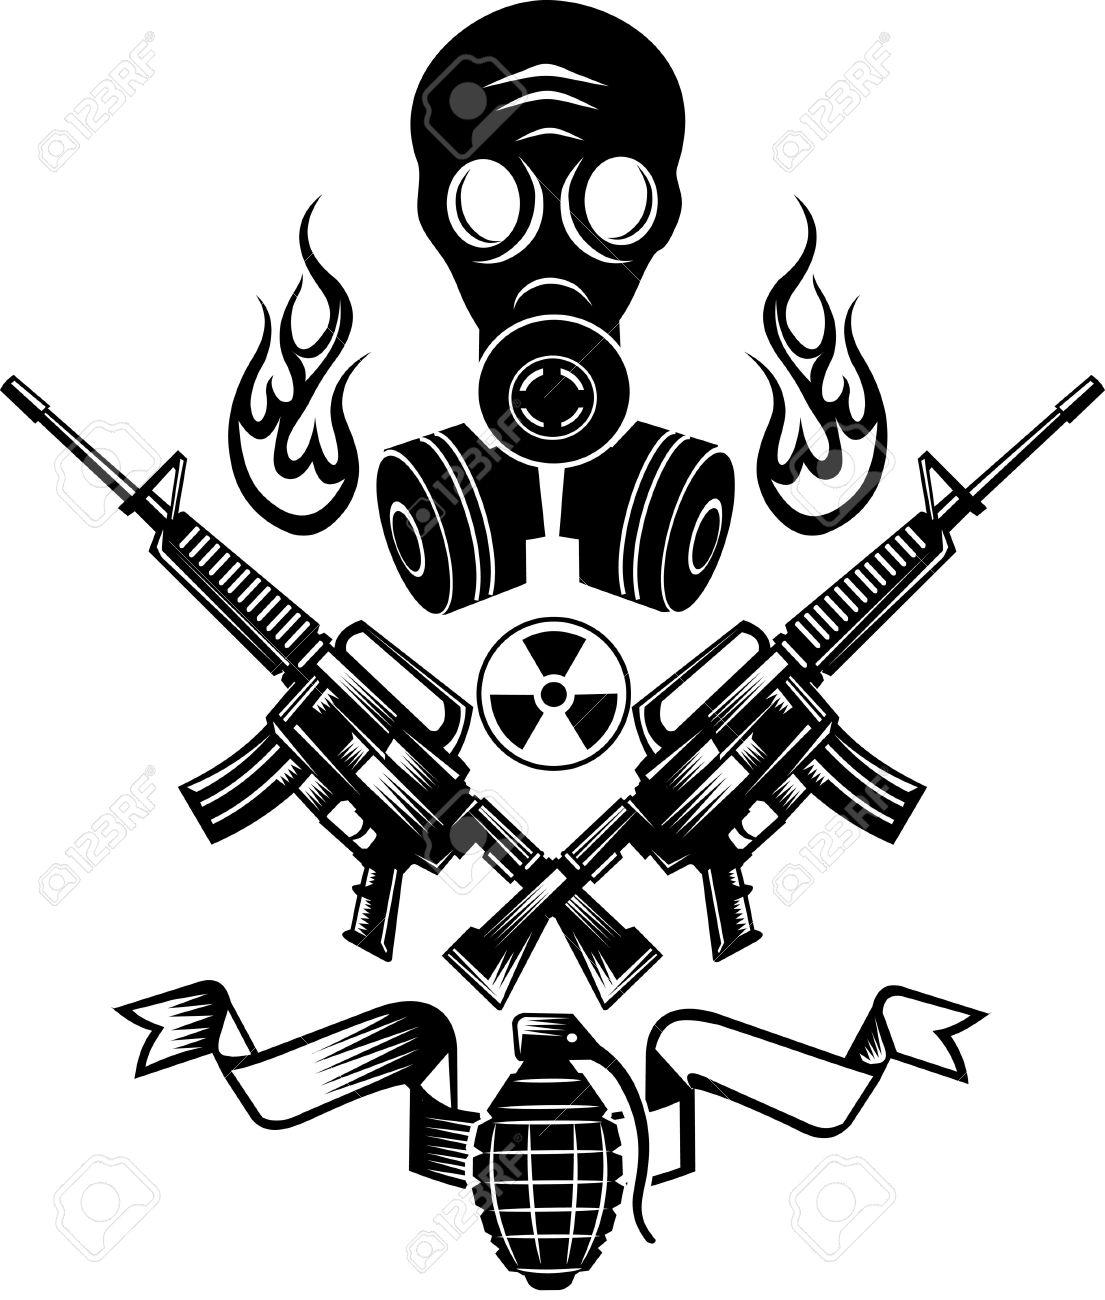 1105x1300 Guns And Grenade Bomb. Tattoo Combat Gas Mask Royalty Free